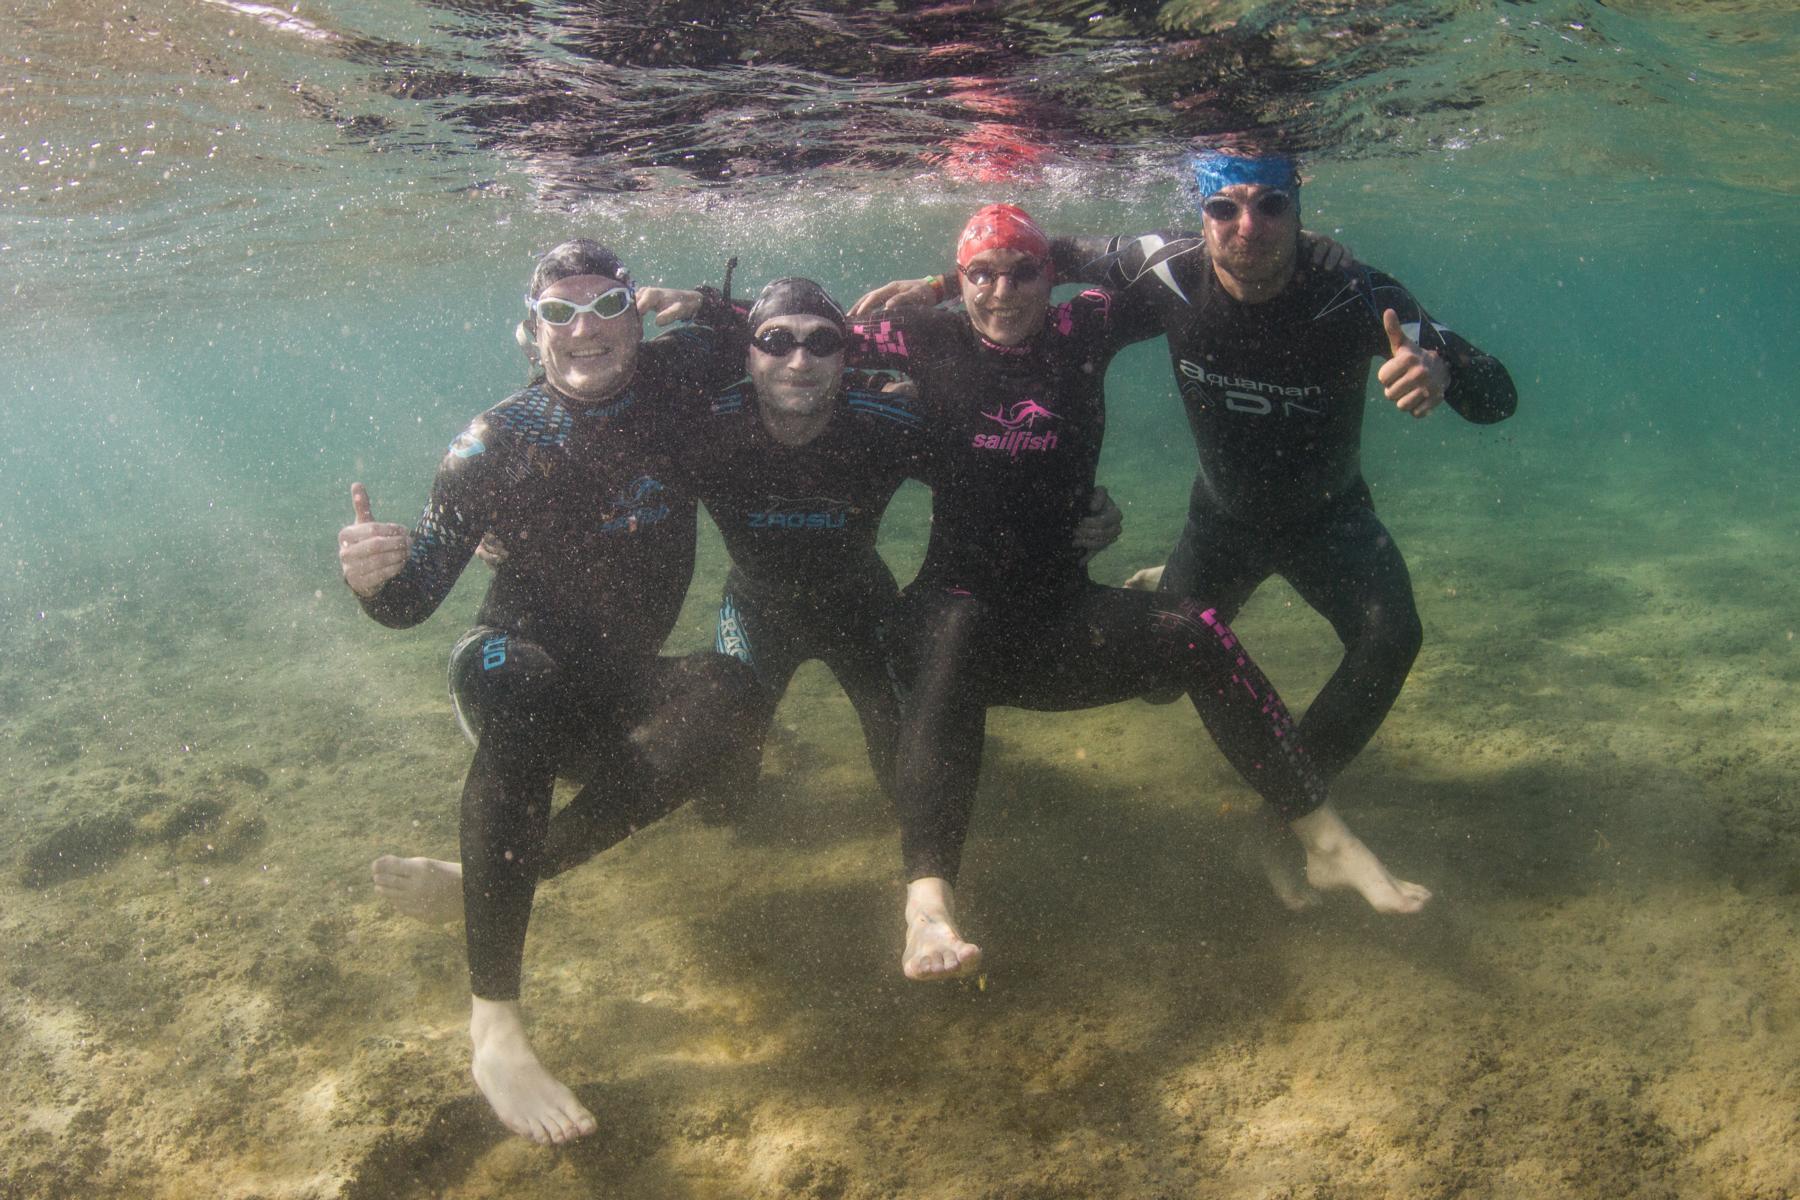 Freiwassersession-Pro.TrainingTours-Triathlon-Camp